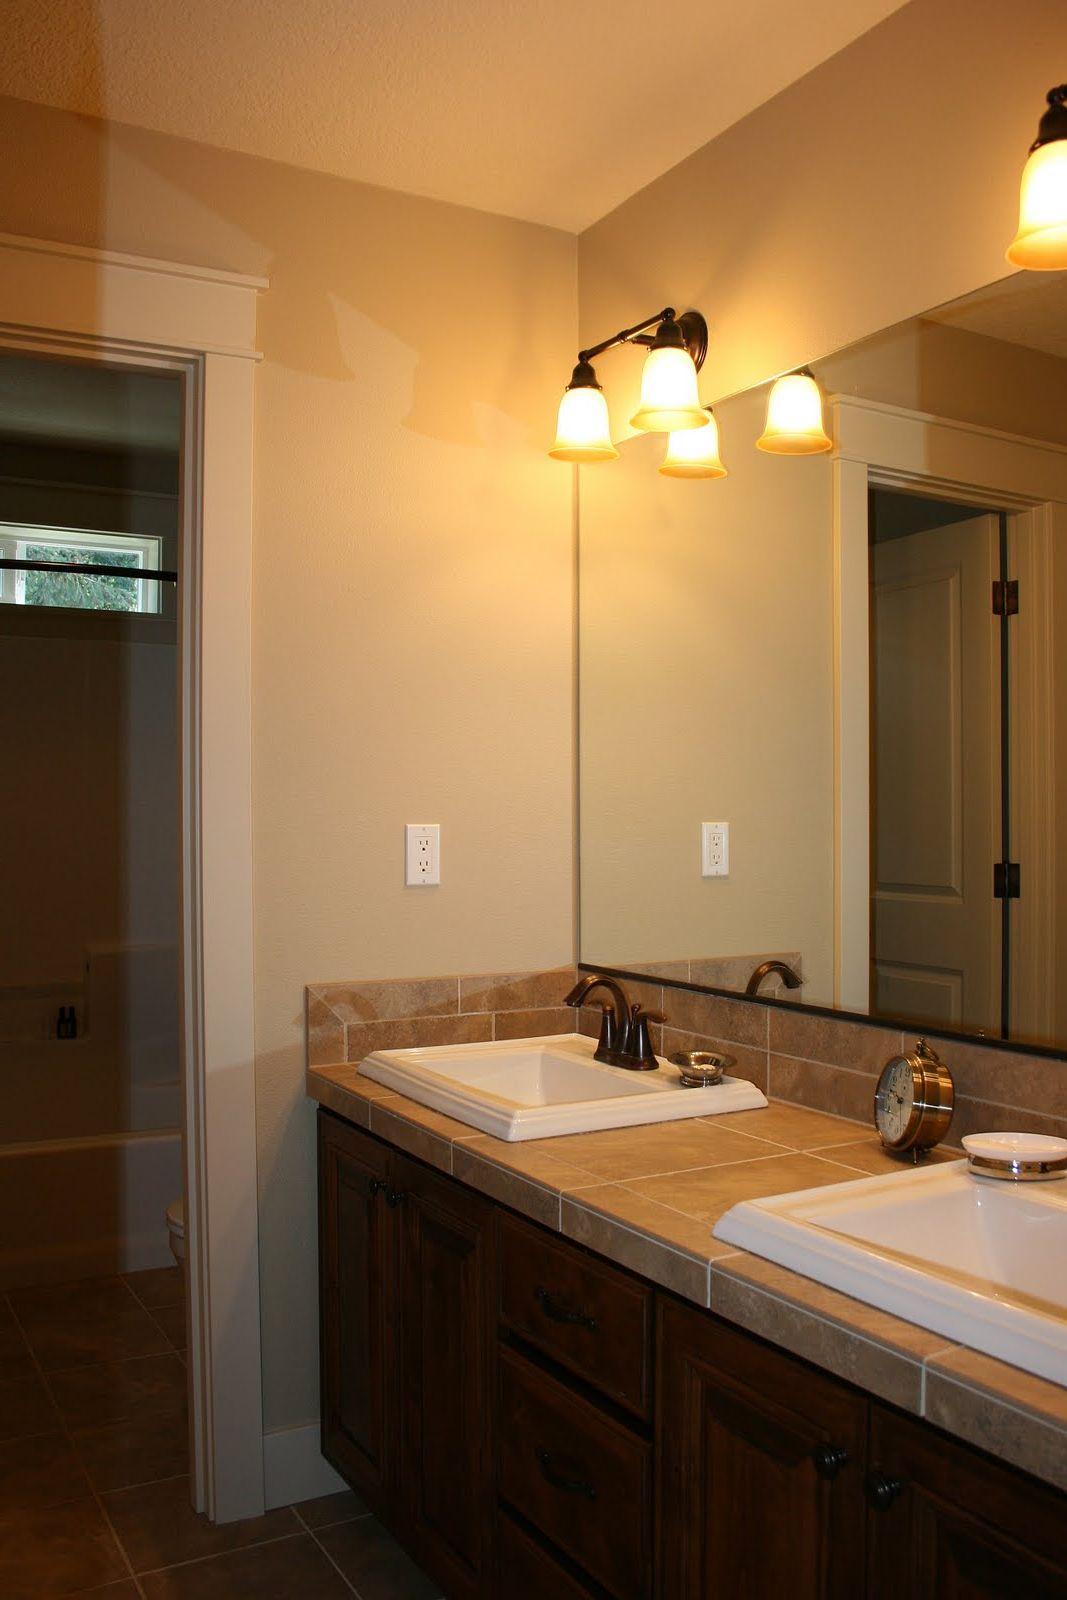 10 gorgeous bathroom light fixtures ideas bathroom ideas rh pinterest com